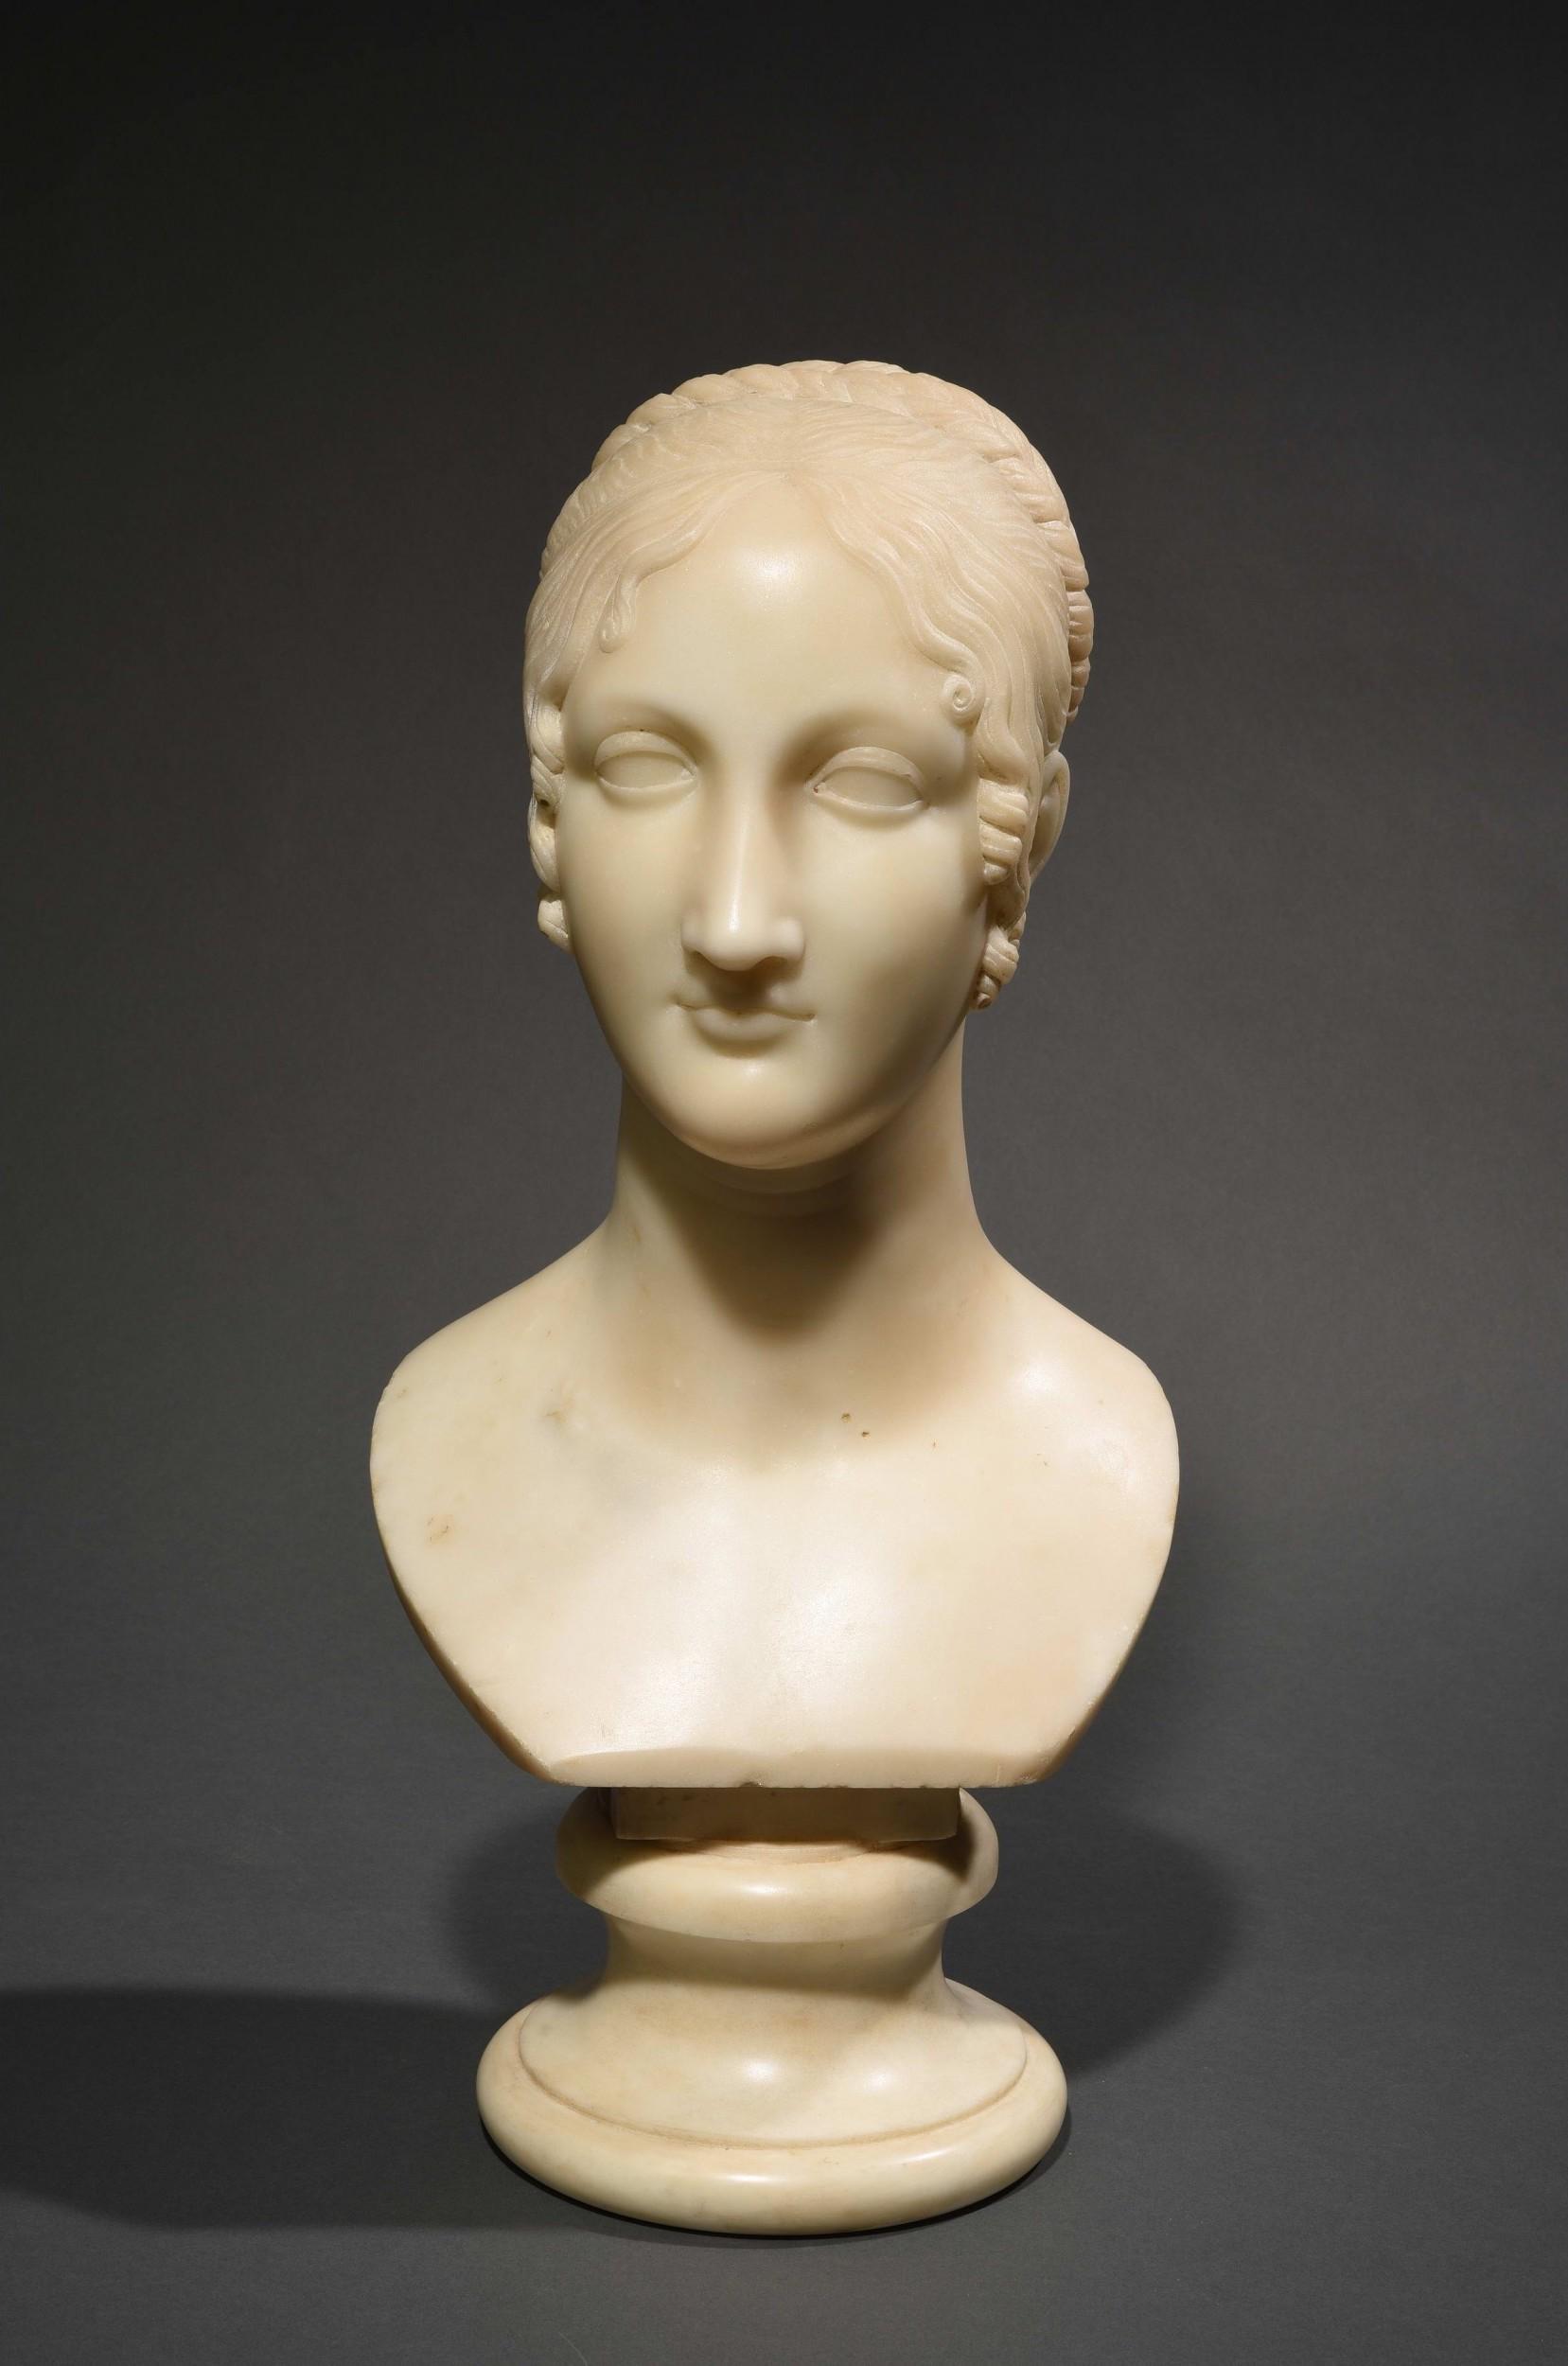 Antonio Canova, Lucretia d'Este, 1821-22 | Foto: ©HVMC